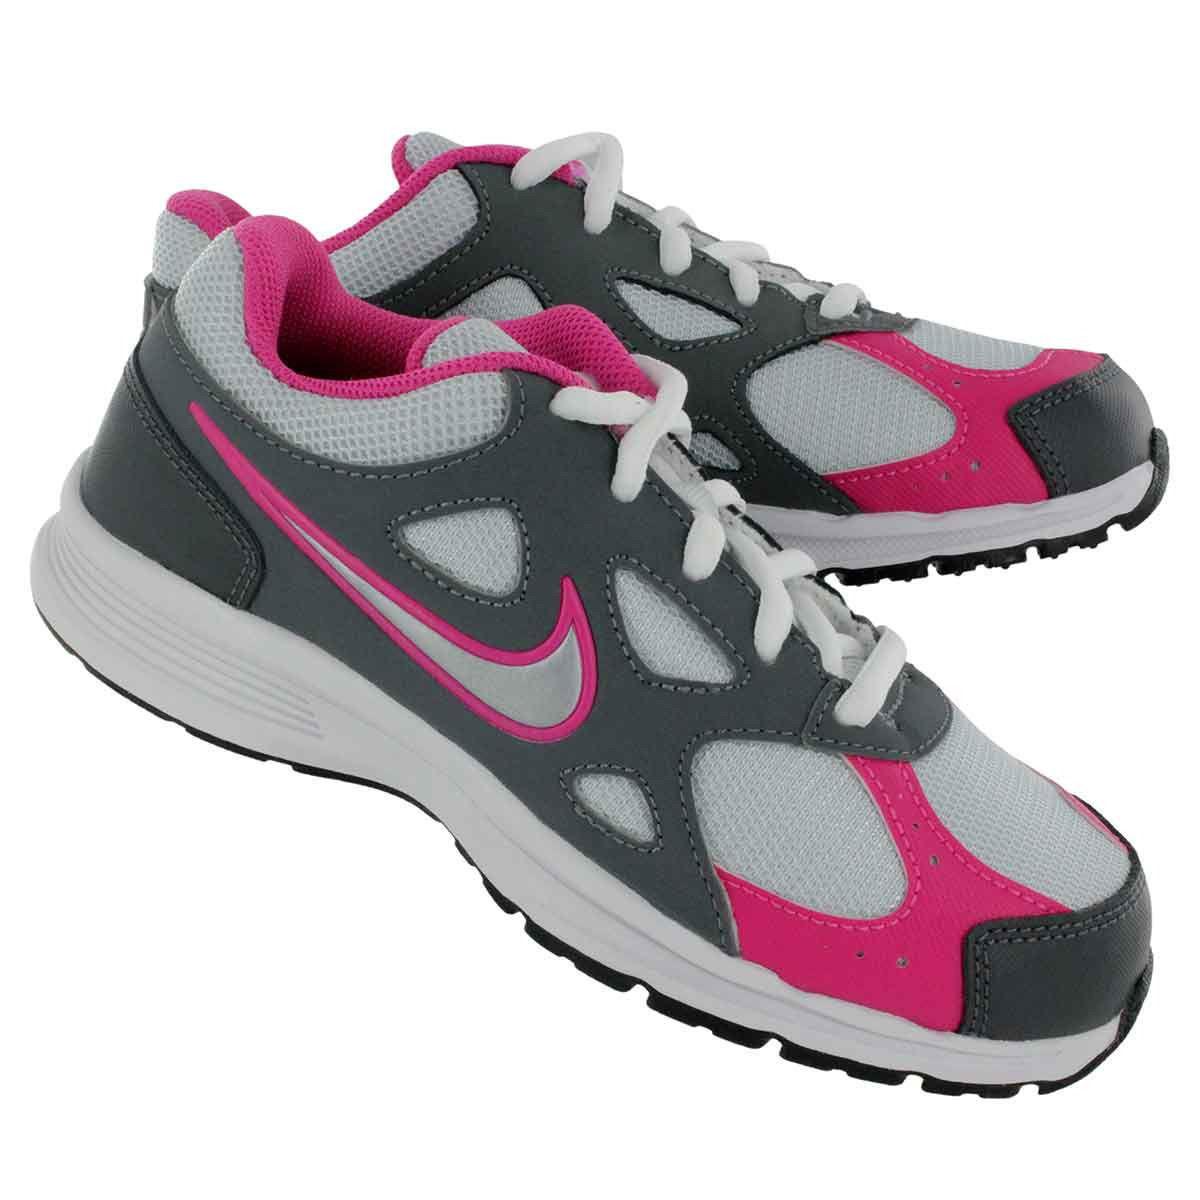 dc20863ac3 Girls Youth Nike Advantage Runner 2 (Gs) and 50 similar items. Nikegirls